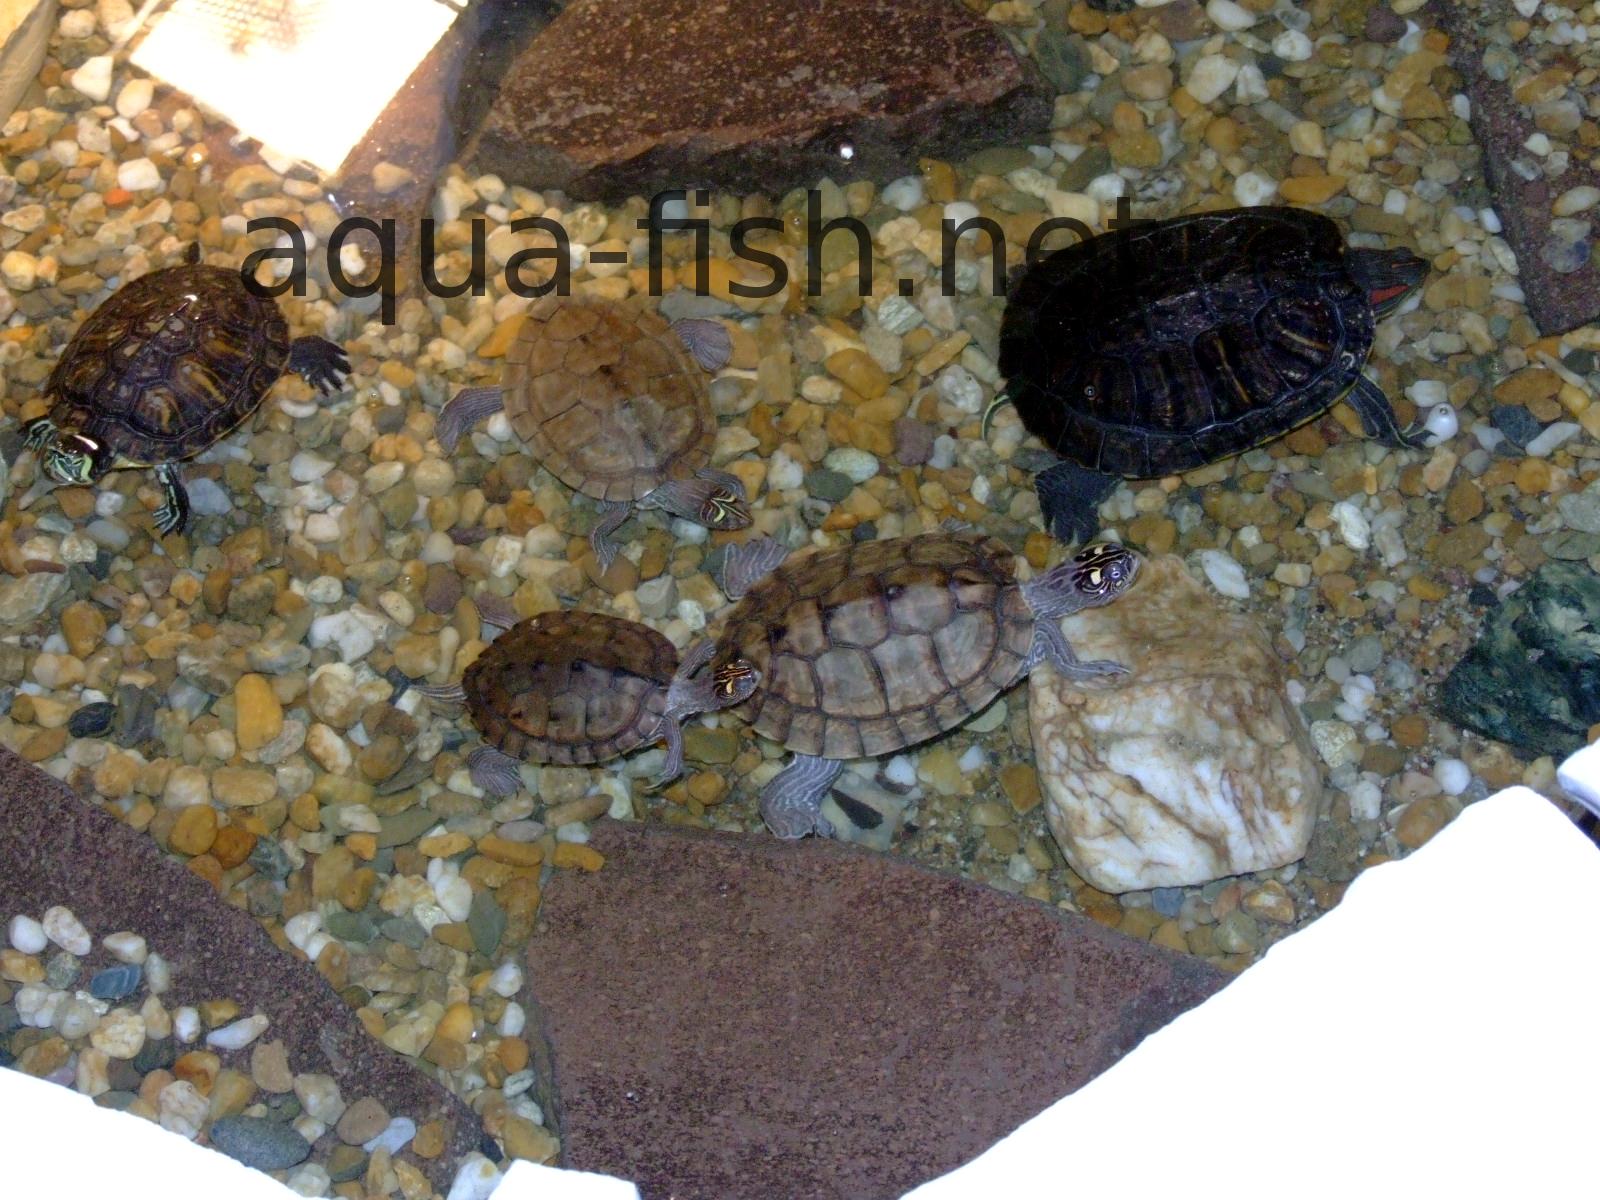 Aquarium Turtles Species : Turtle Aquariums - Setting up and Feeding Turtles